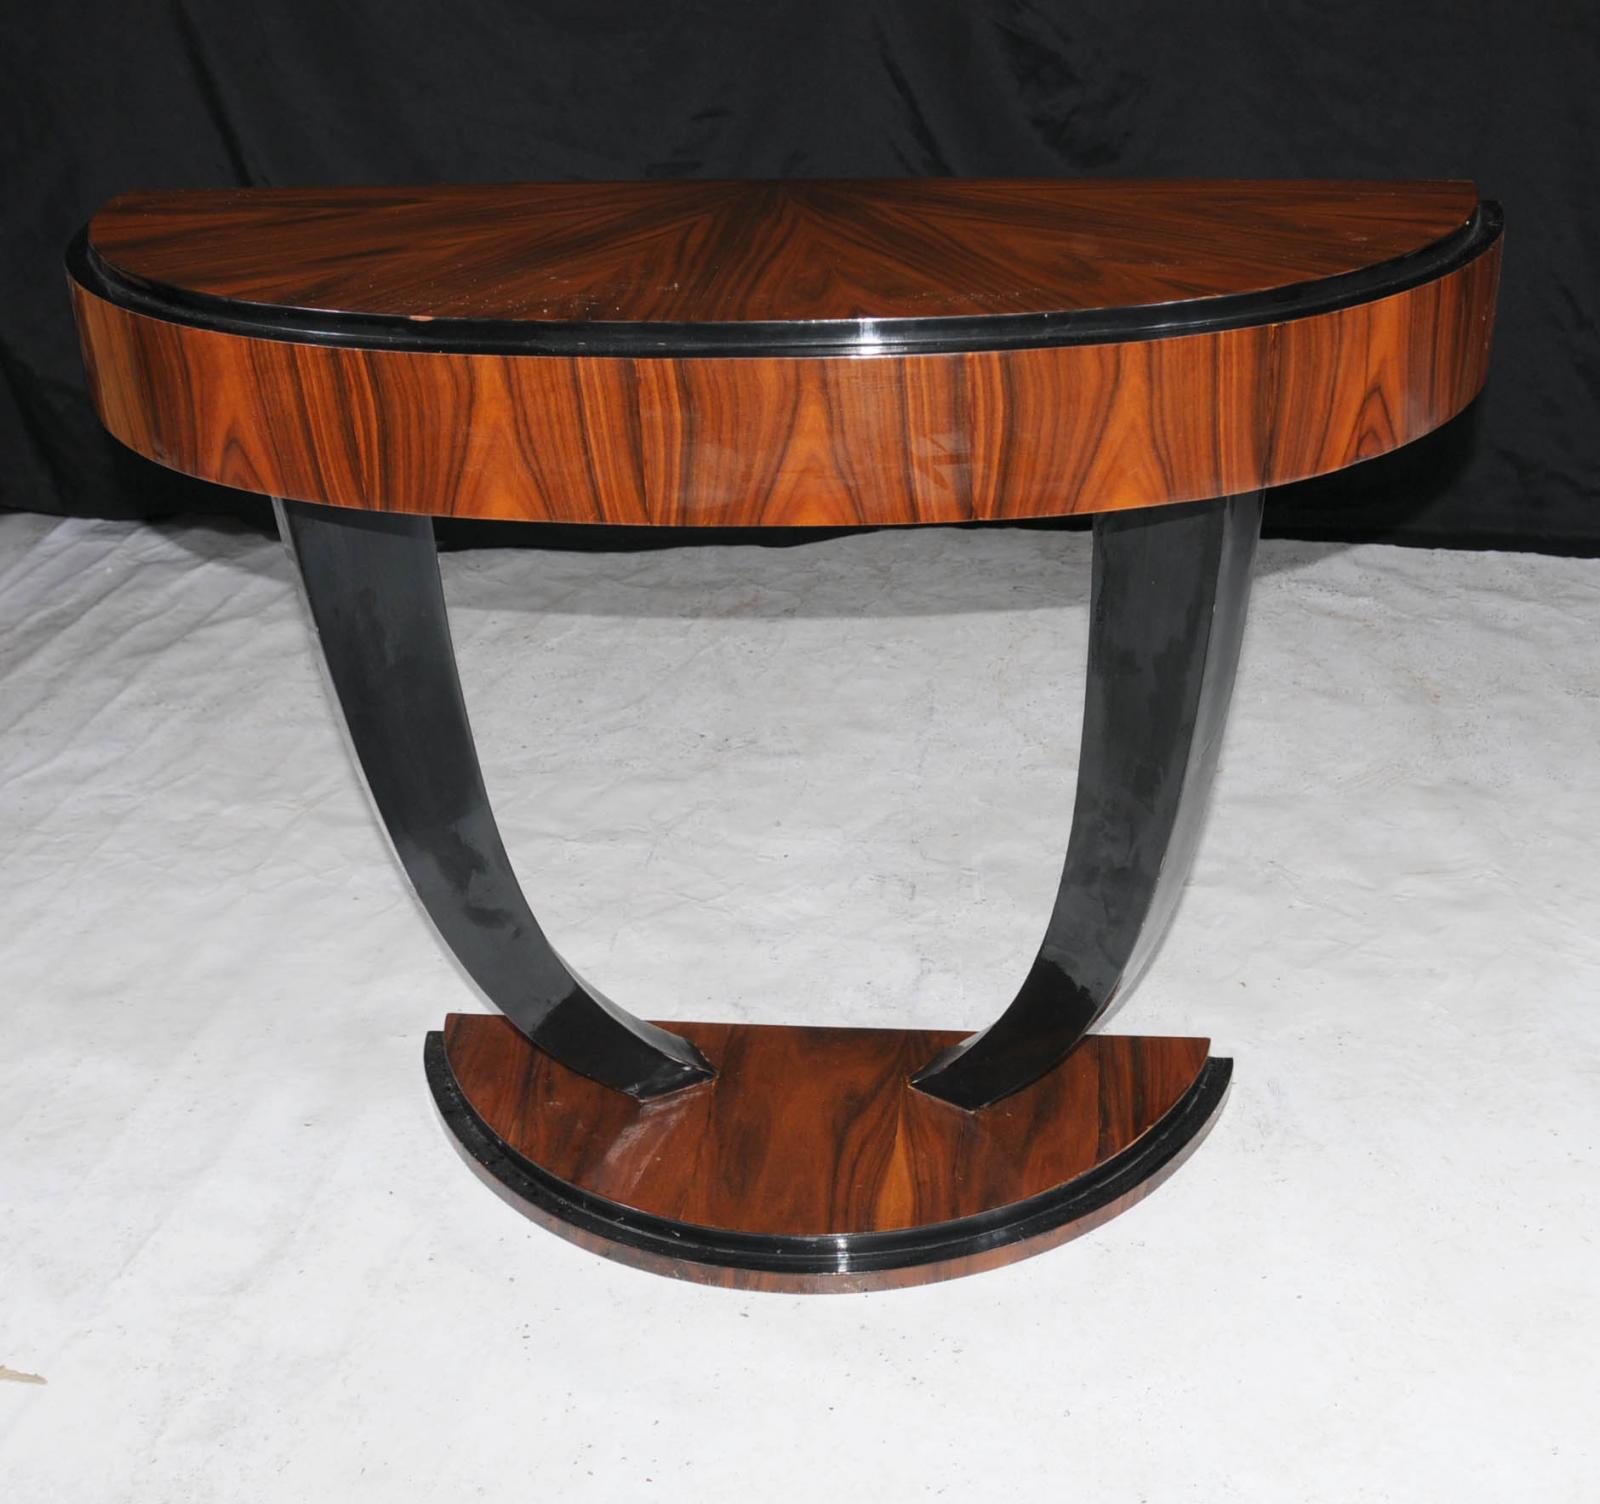 Art Deco Foyer Table : Art deco modernist console table hall tables s